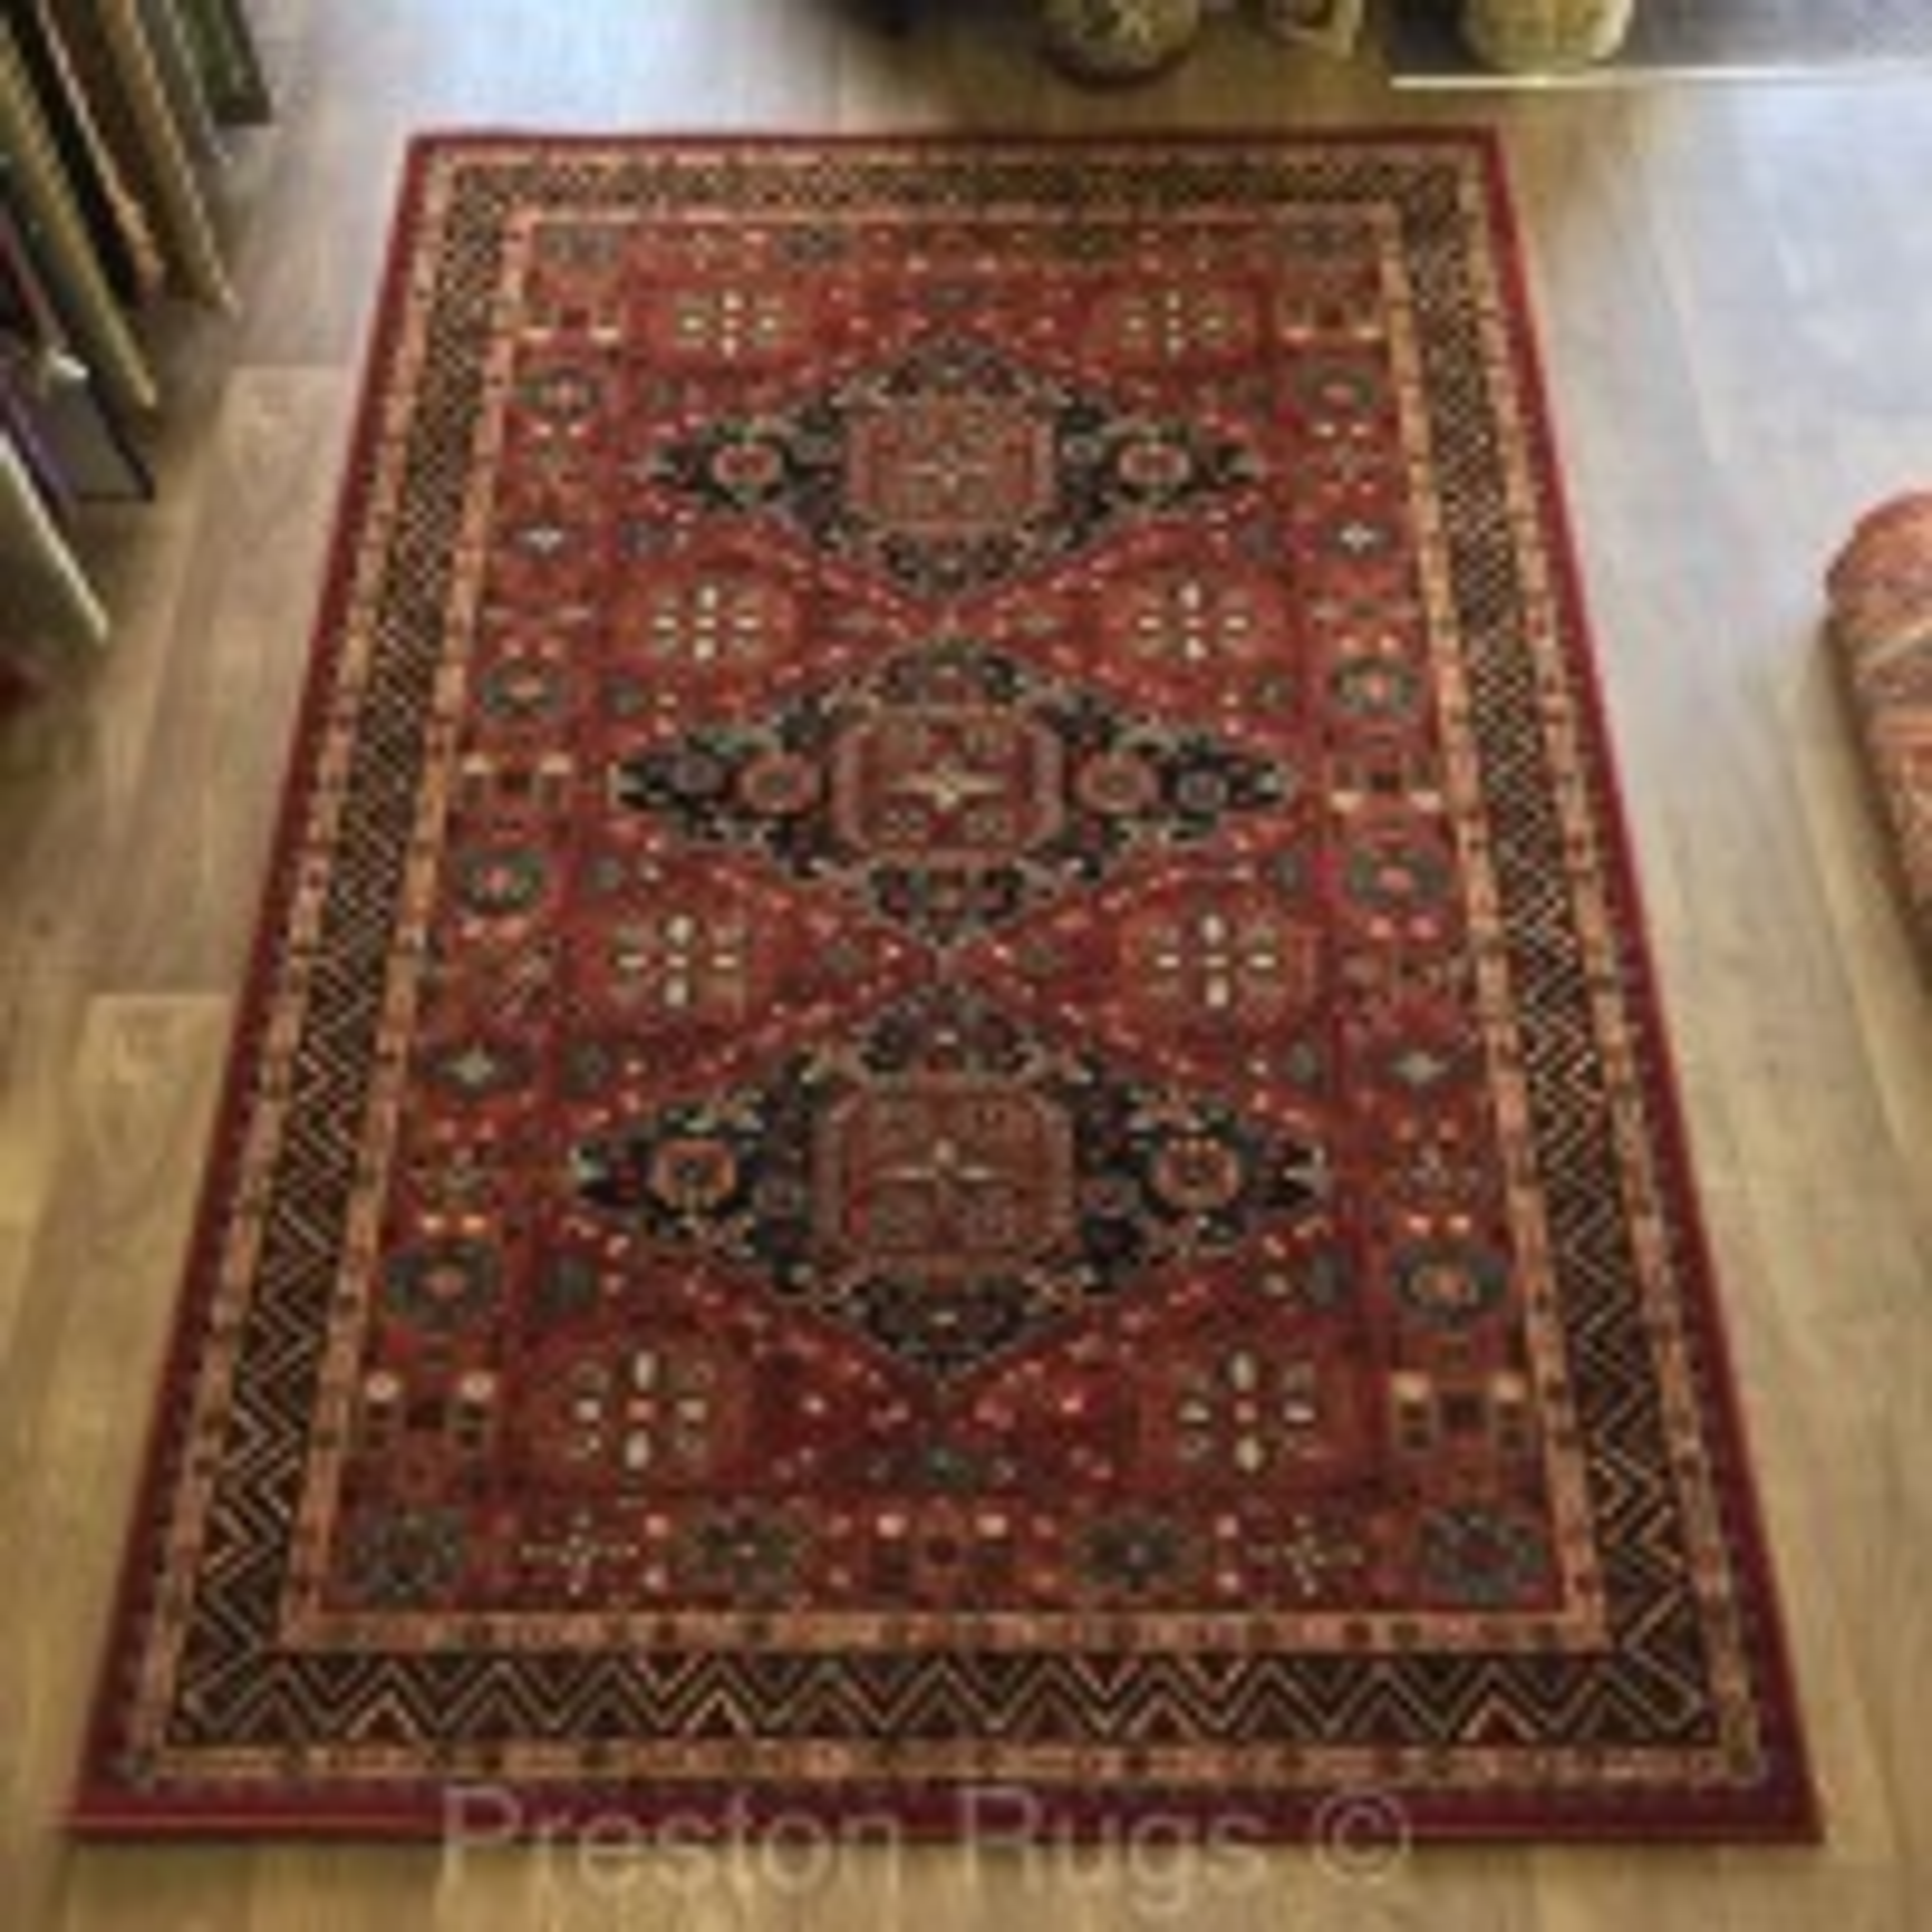 "Kashqai Traditional Persian Design Rug - 4308/300-240 x 340 cm (7'10"" x 11'2"")"